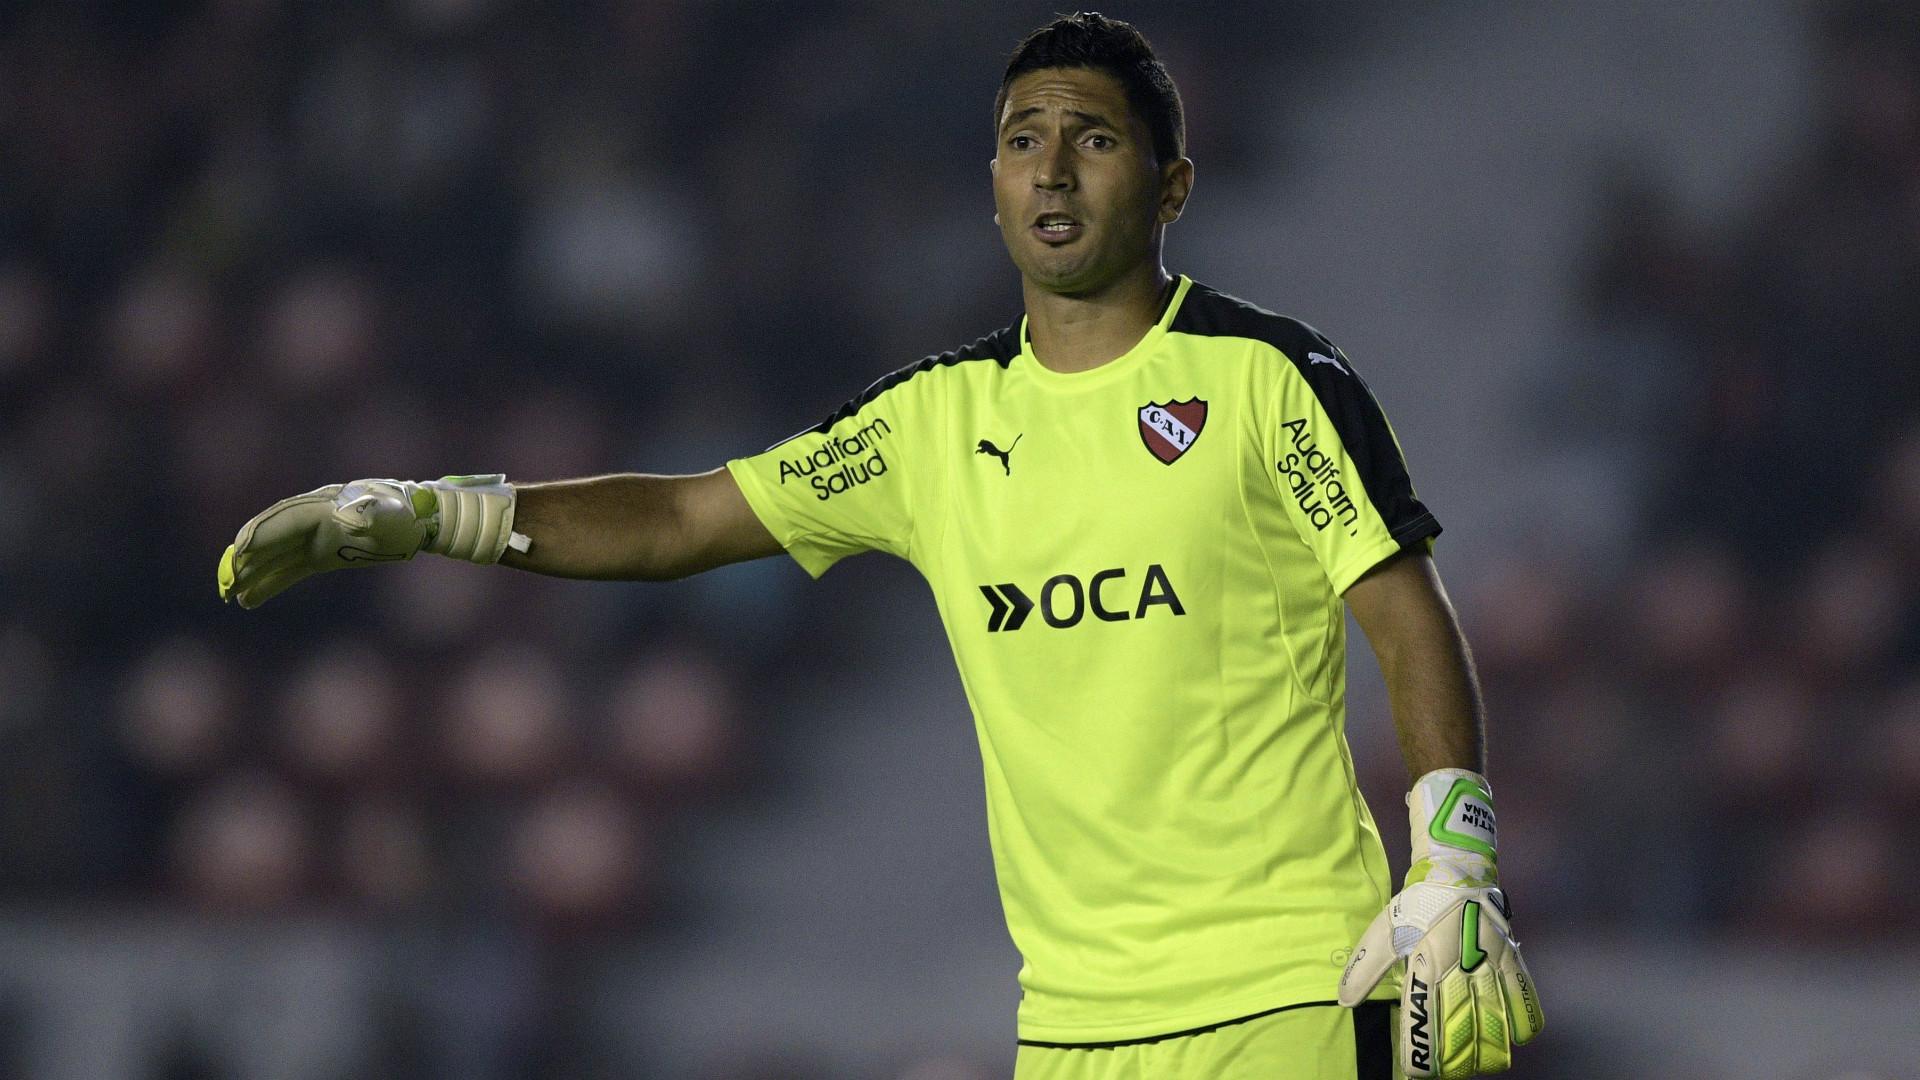 Martin Campaña Independiente Alianza Lima Copa Sudamericana 04042017